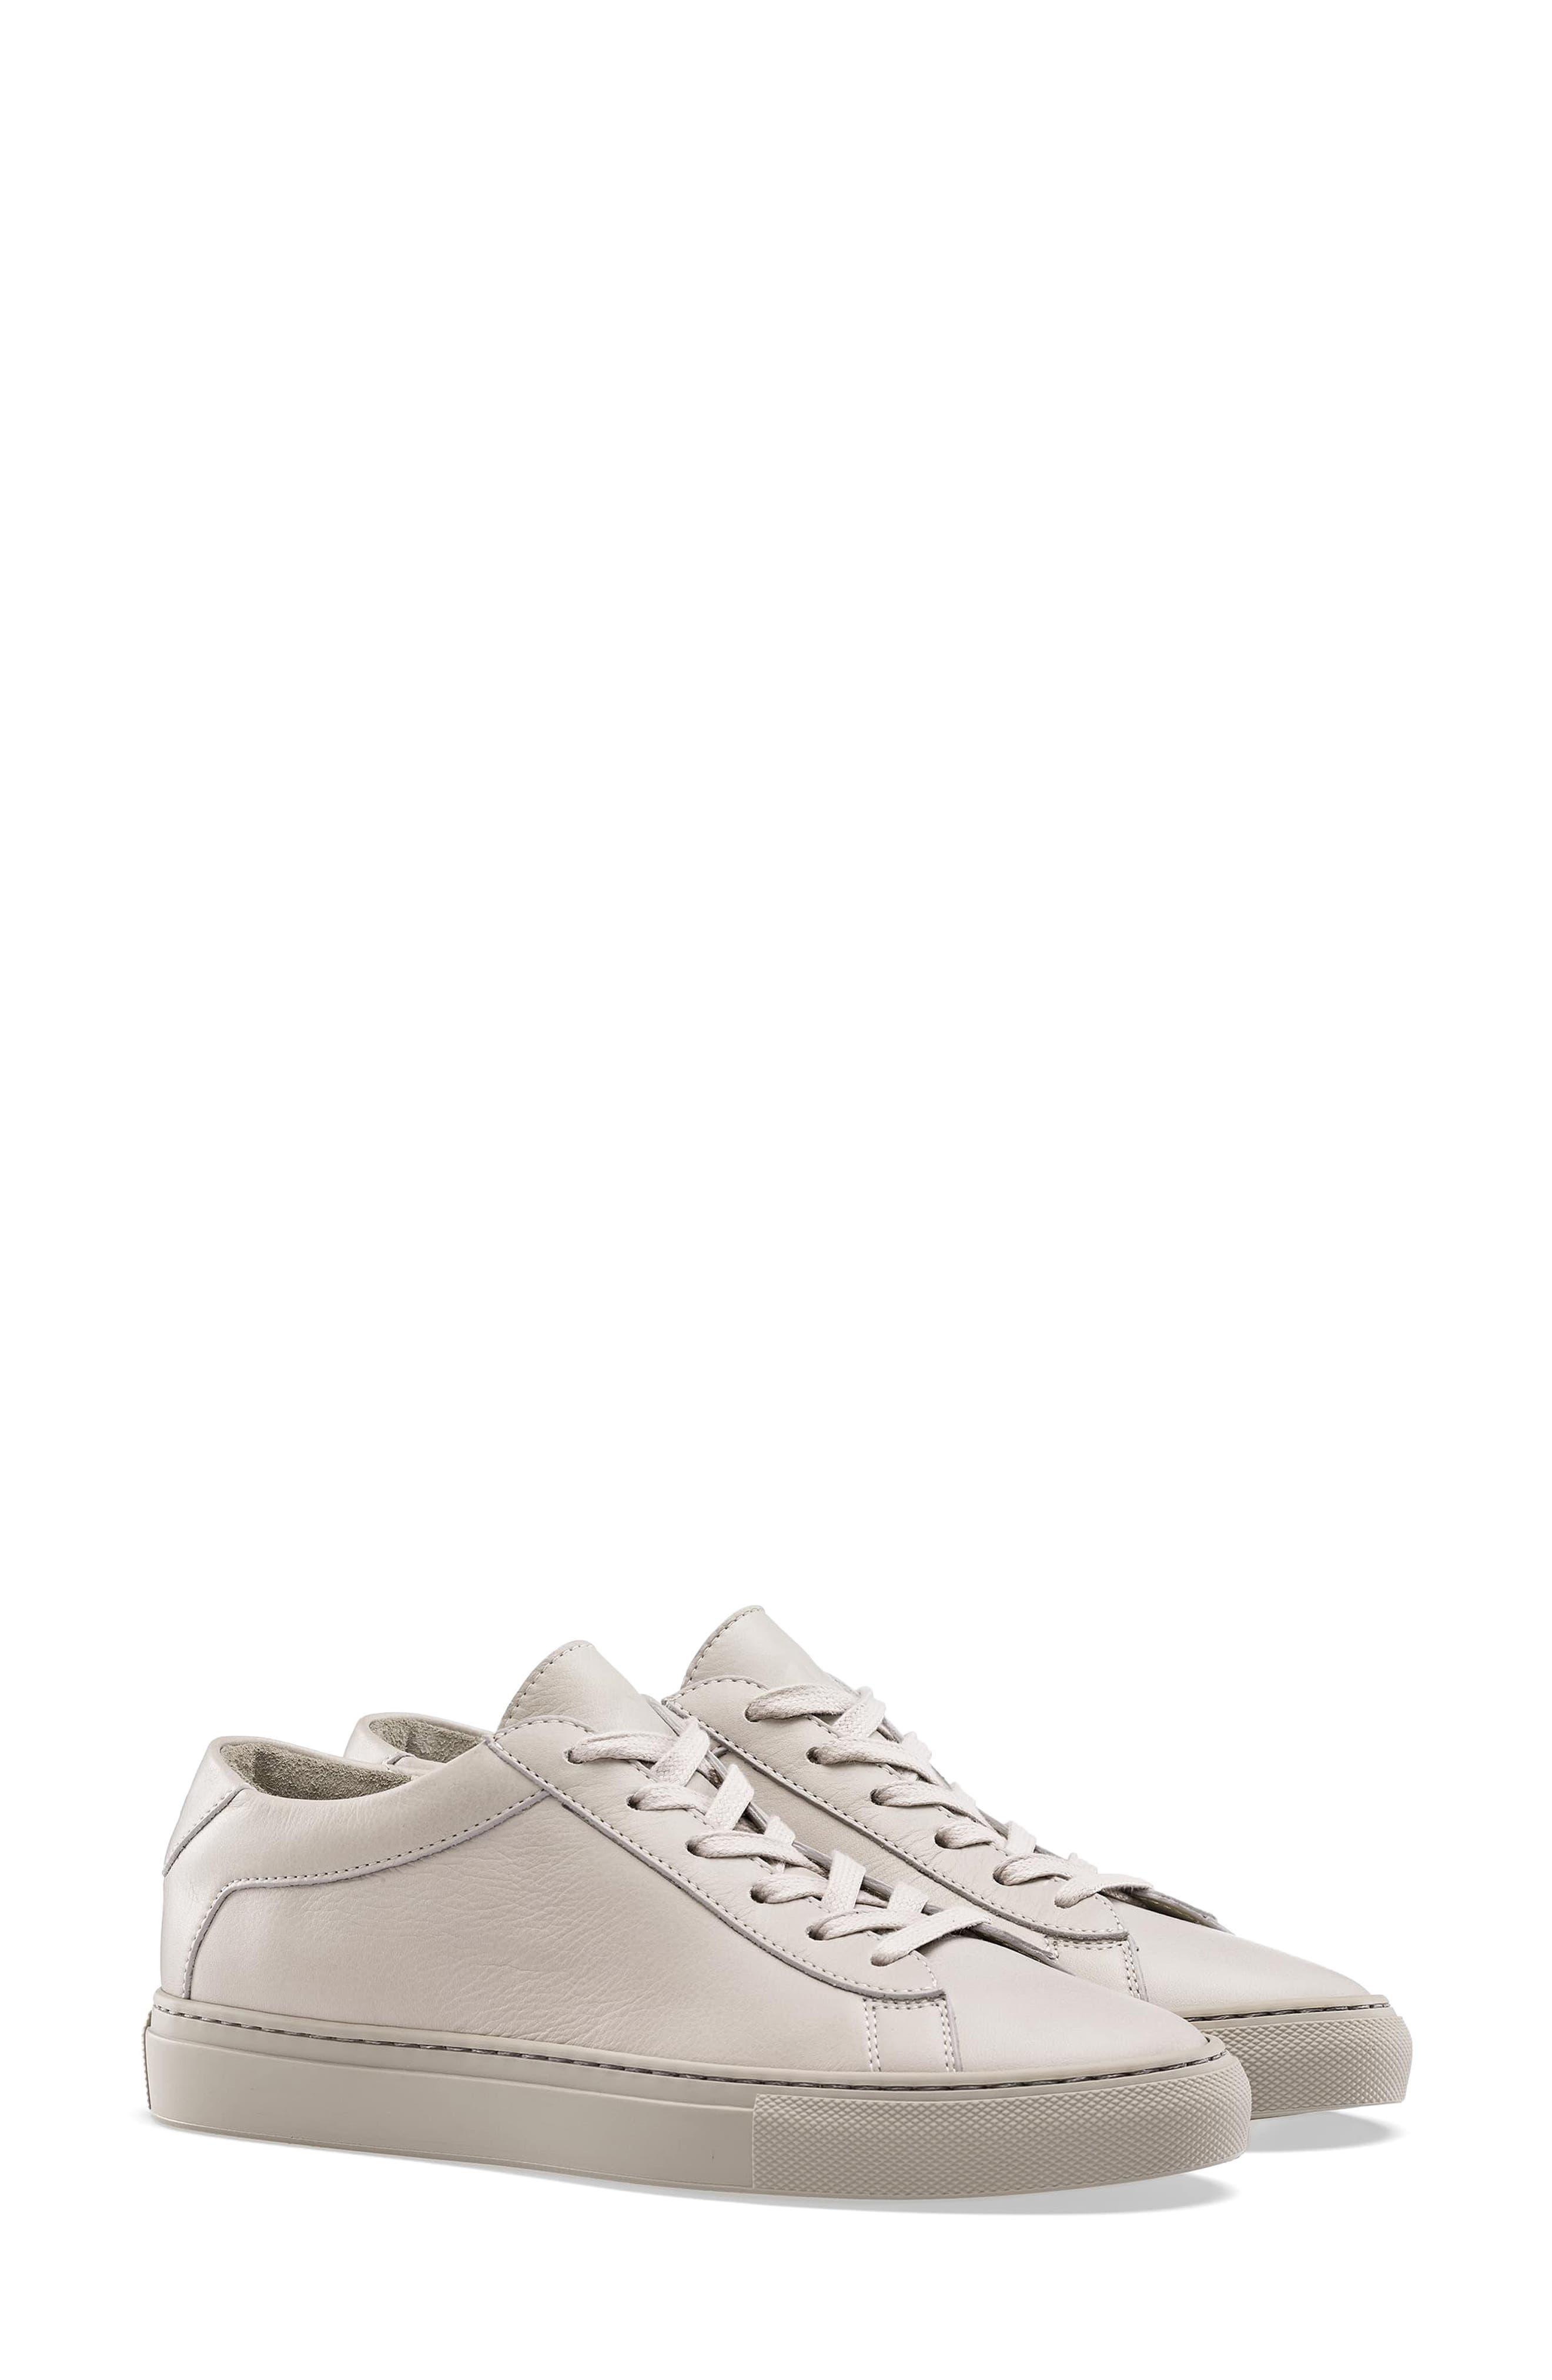 KOIO Sneakers \u0026 Athletic Shoes | Nordstrom